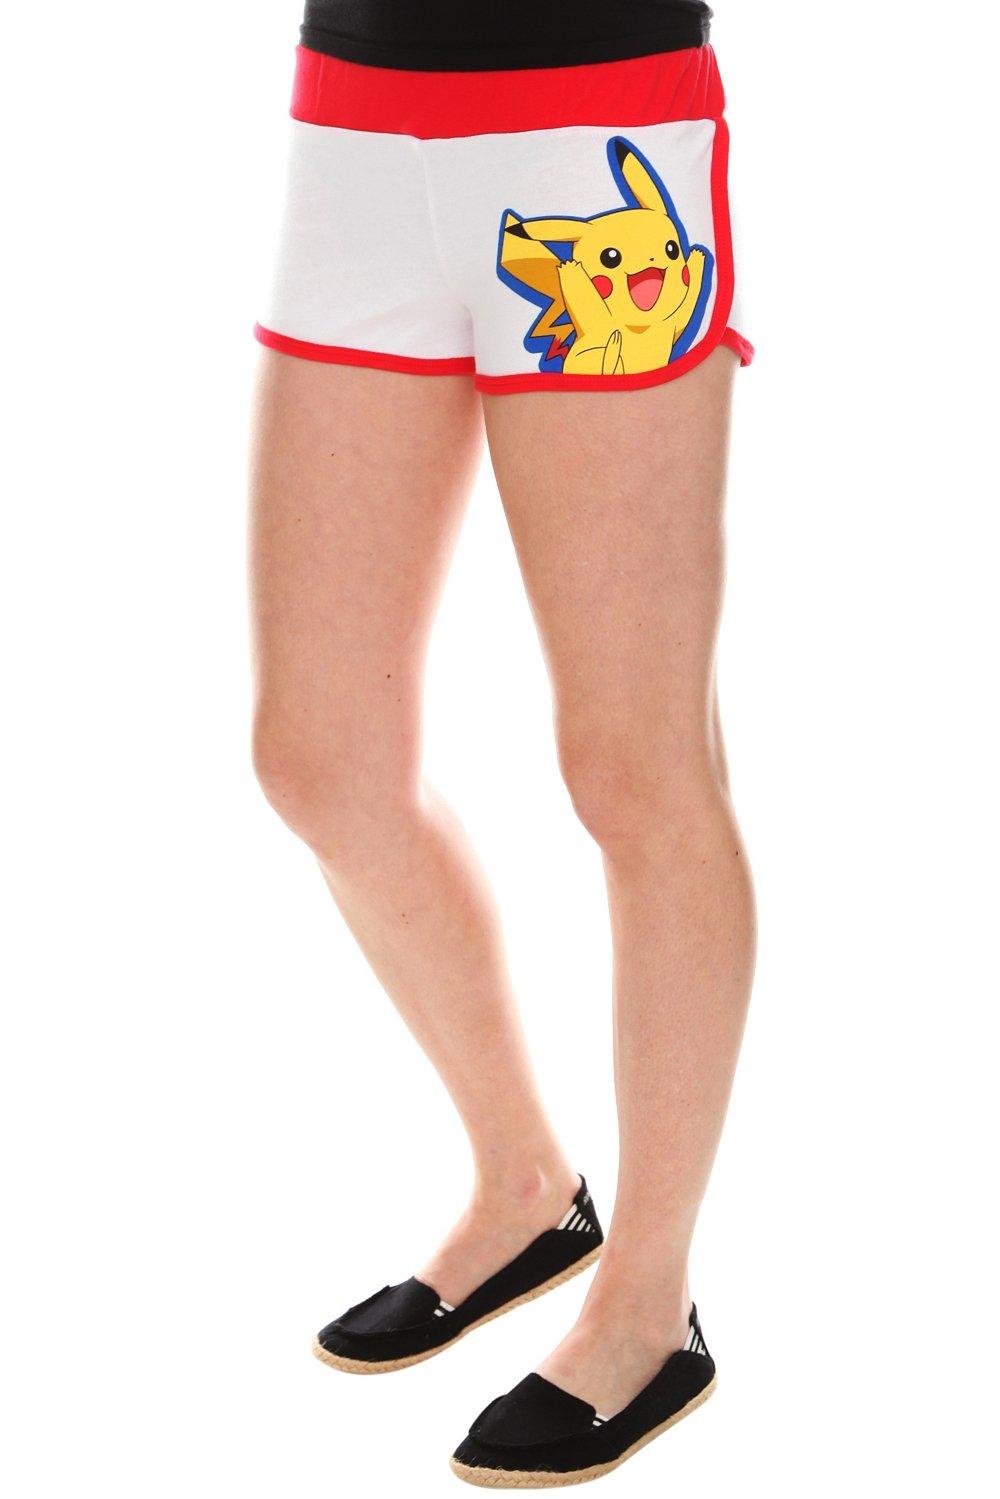 Pokémon Red & White Booty Shorts